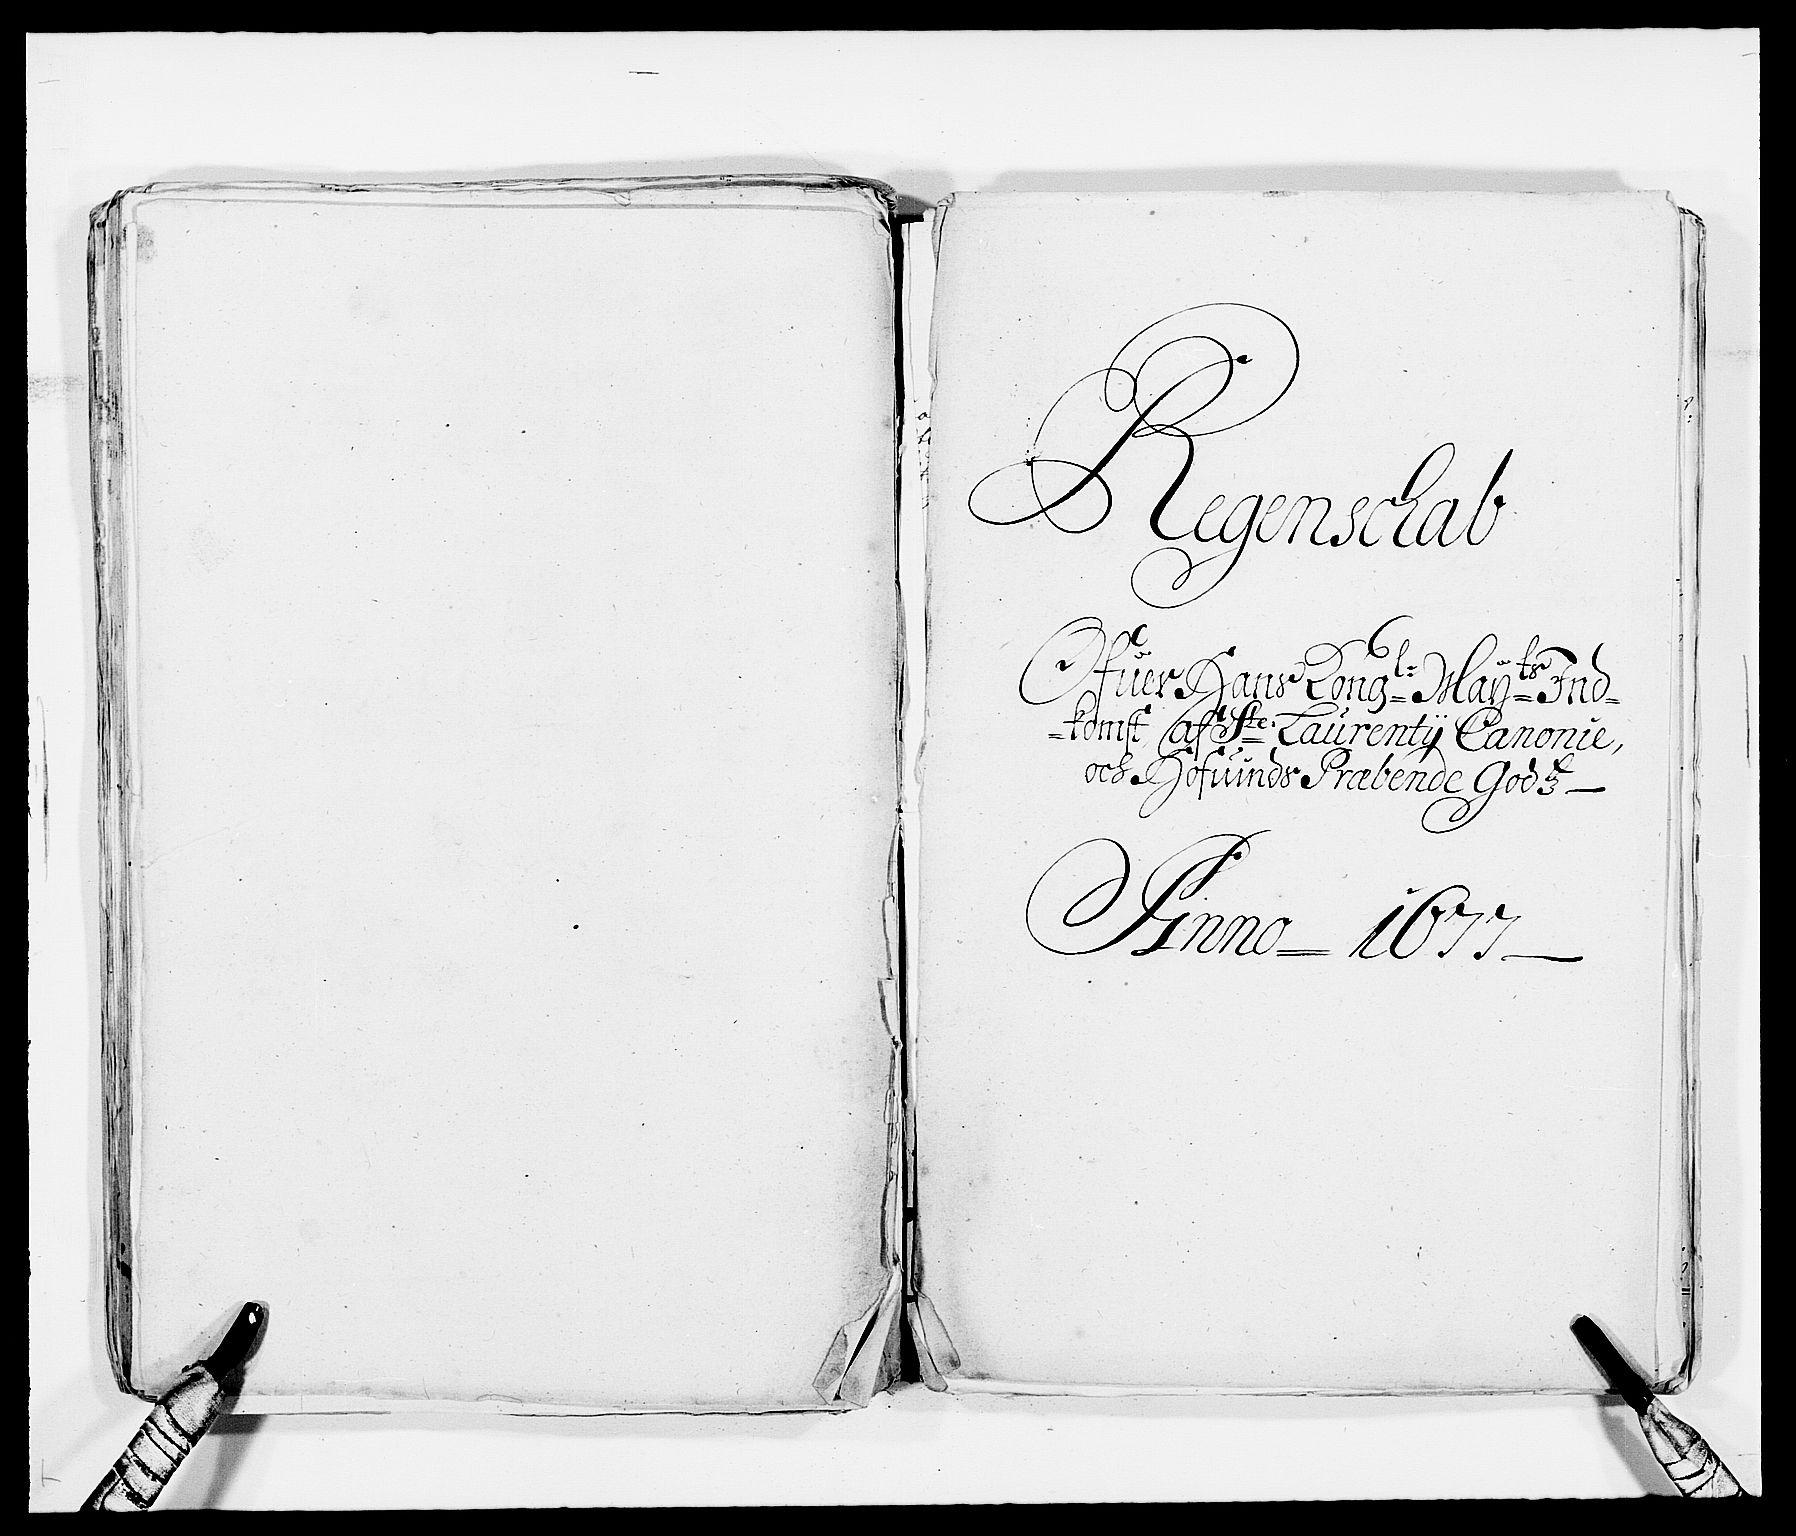 RA, Rentekammeret inntil 1814, Reviderte regnskaper, Fogderegnskap, R32/L1845: Fogderegnskap Jarlsberg grevskap, 1676-1678, s. 60